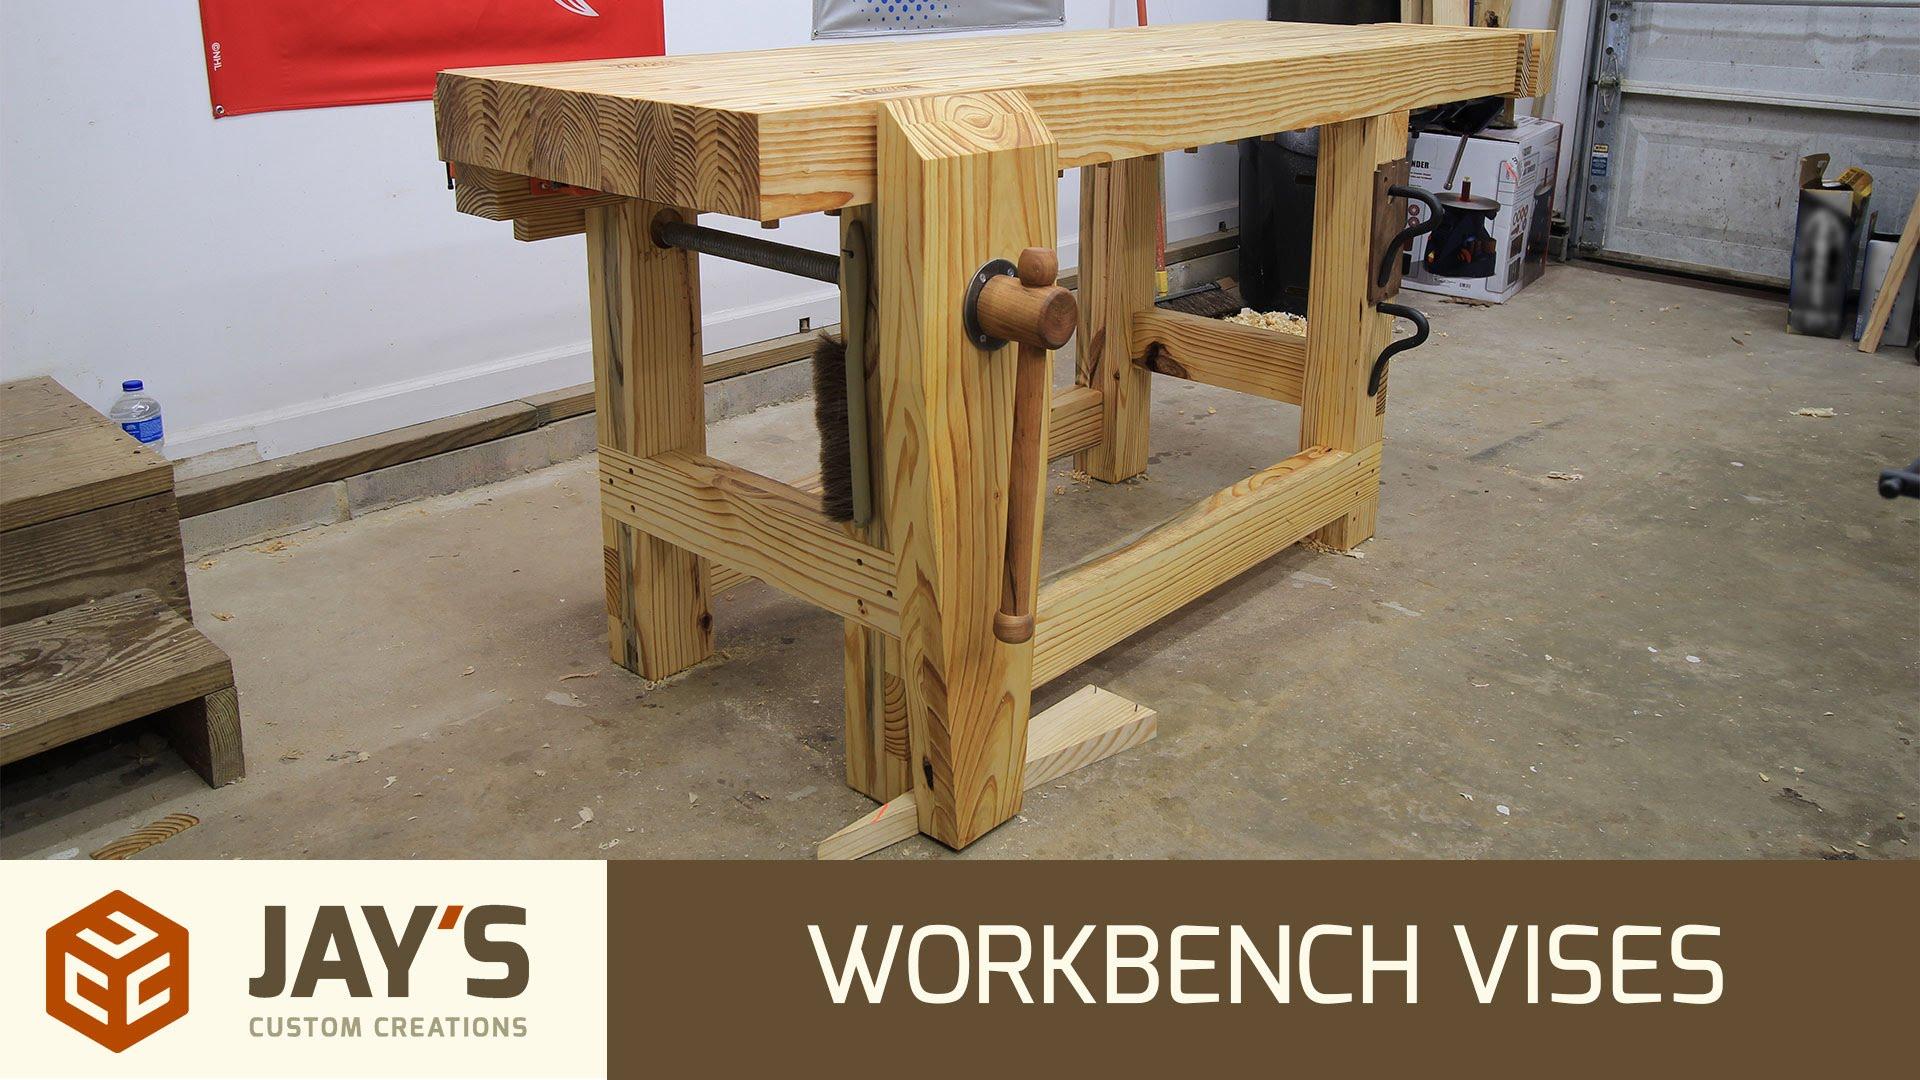 workbench vises | jays custom creations